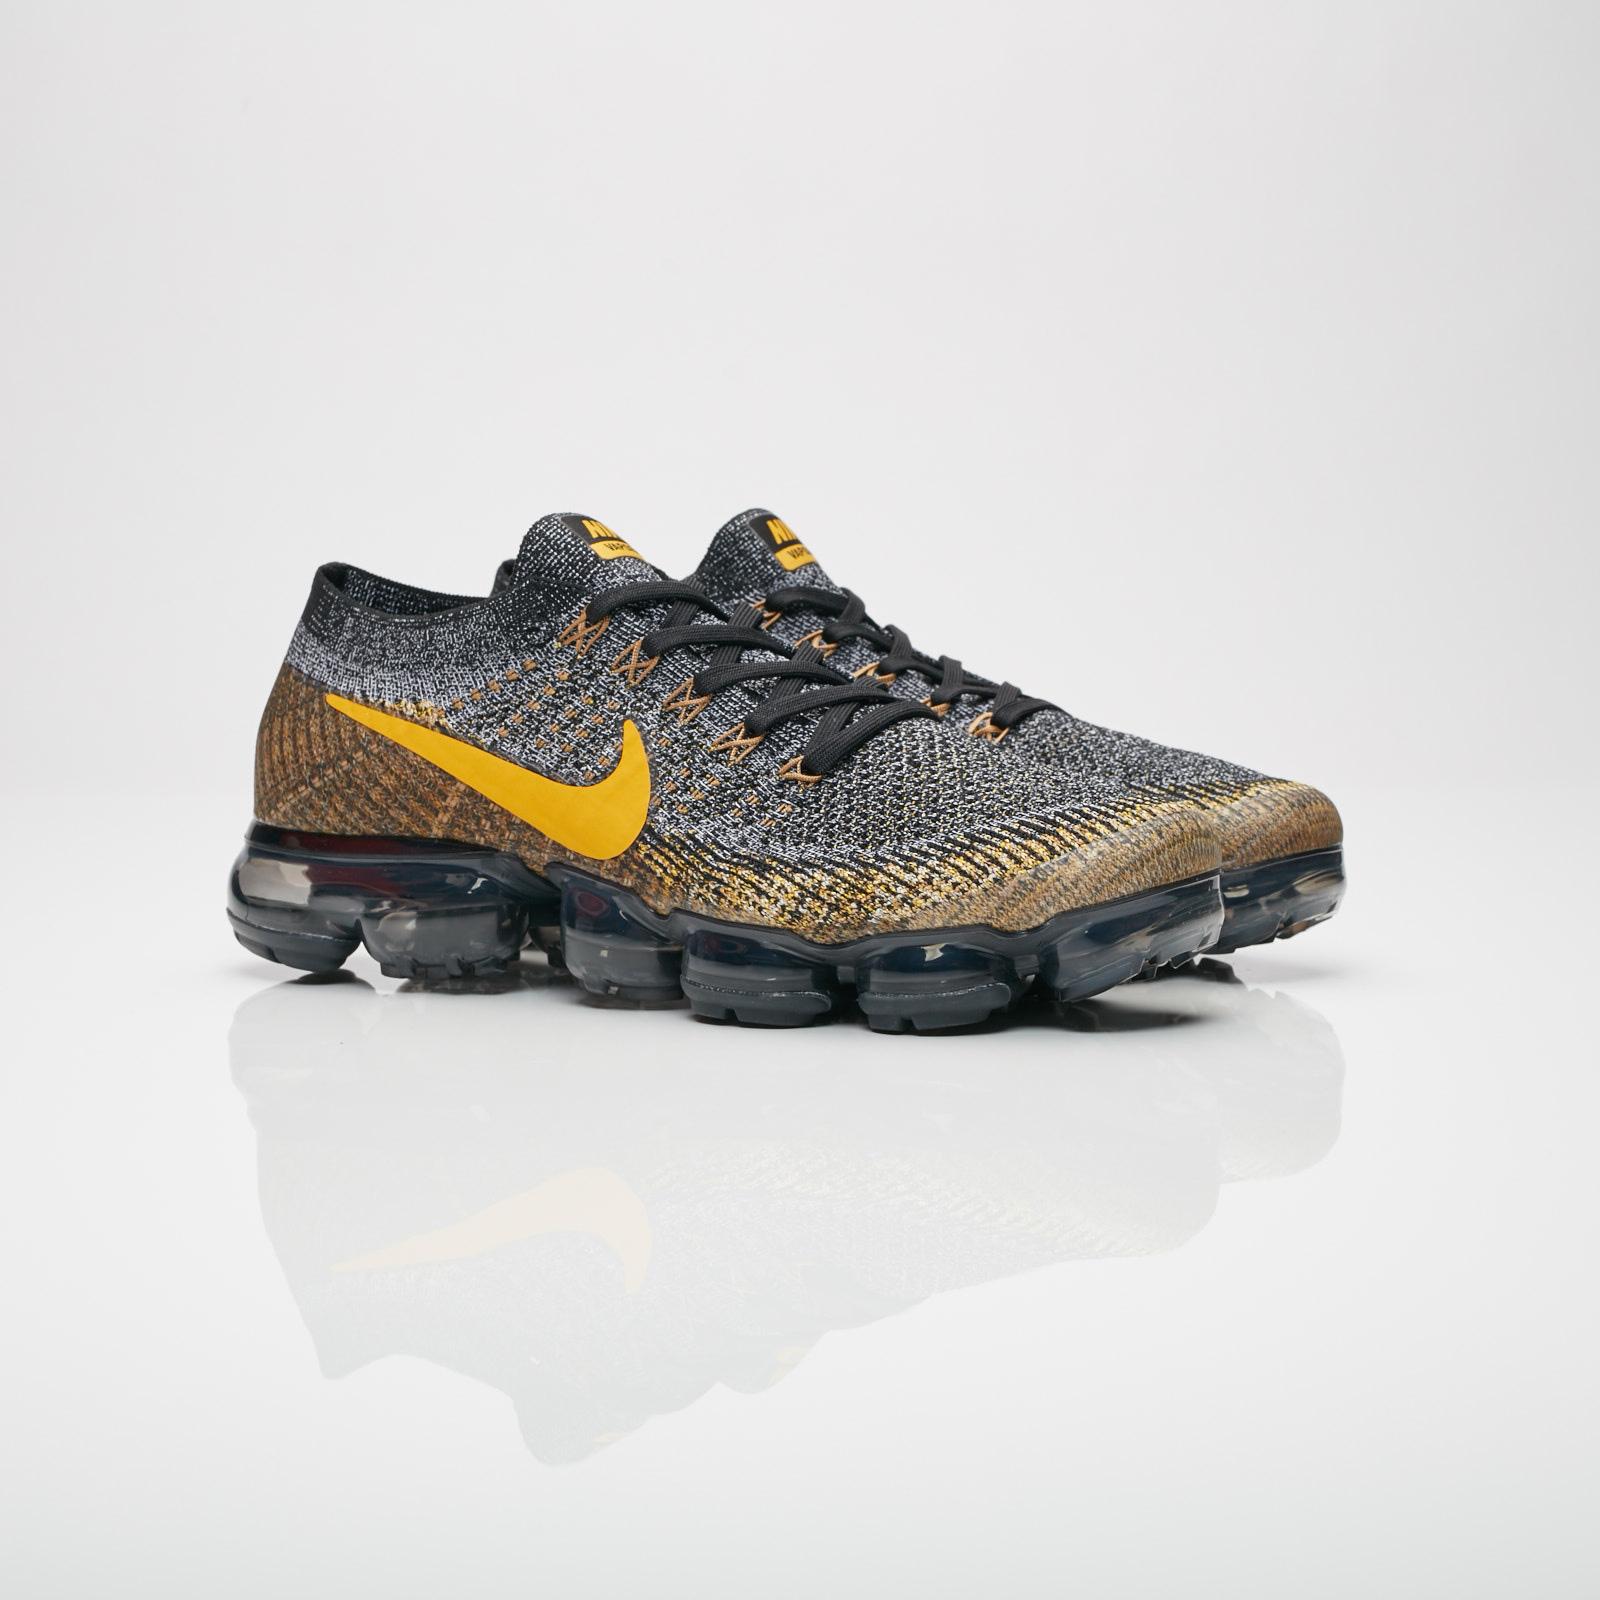 78318885b7 Nike Air Vapormax Flyknit - 849558-021 - Sneakersnstuff